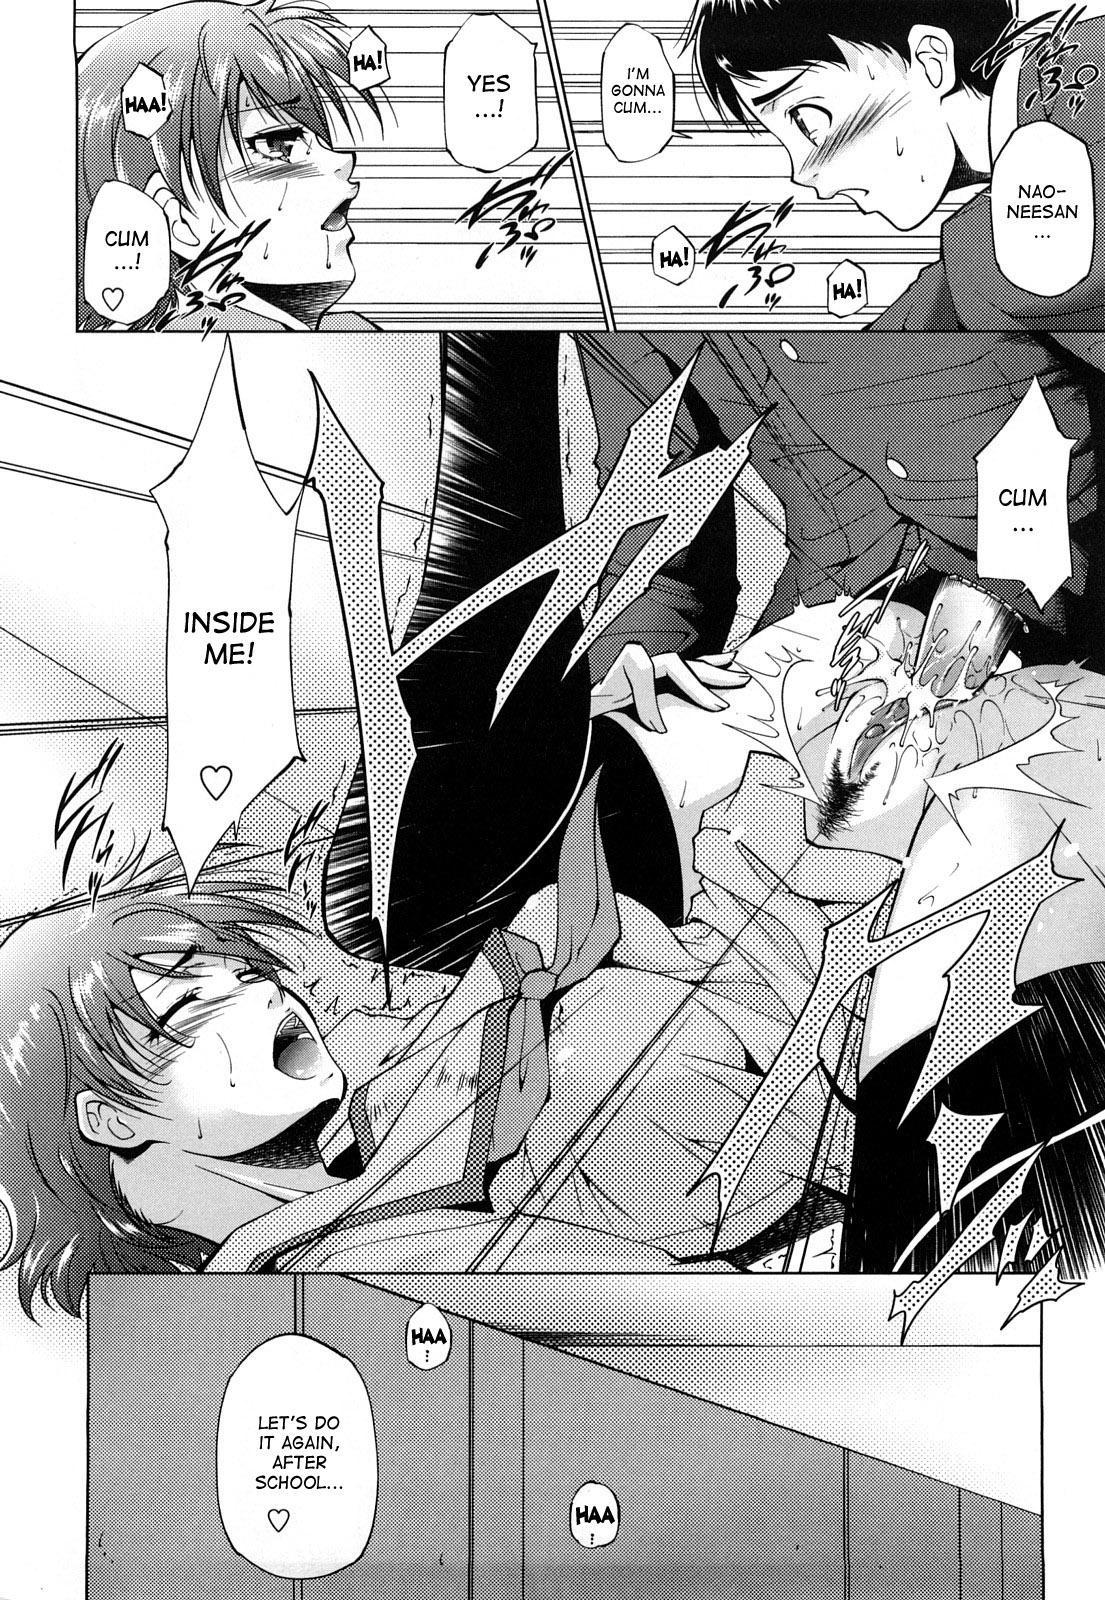 [Touma Itsuki] Ane-sama Inkou - Sister's Sexy Smell Ch. 1-6 [English] [desudesu] [Decensored] 73